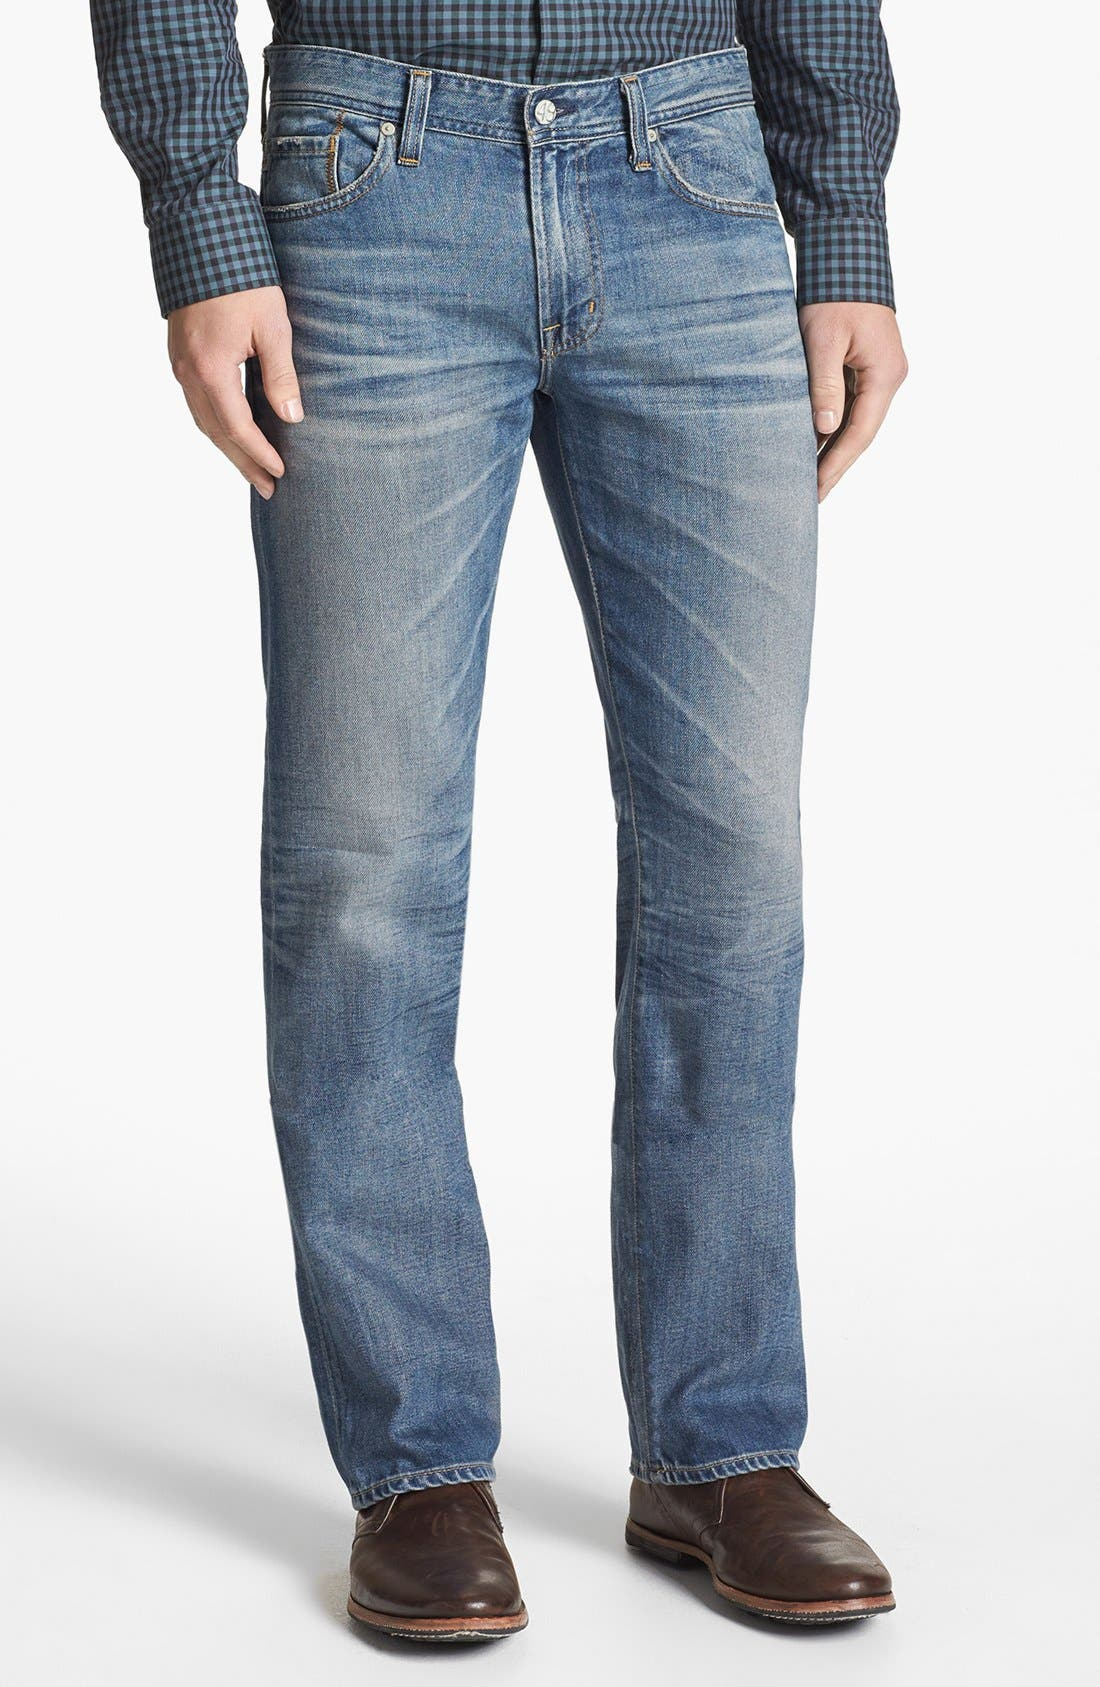 Alternate Image 1 Selected - AG 'Protégé' Straight Leg Jeans (16 Year Fuse)